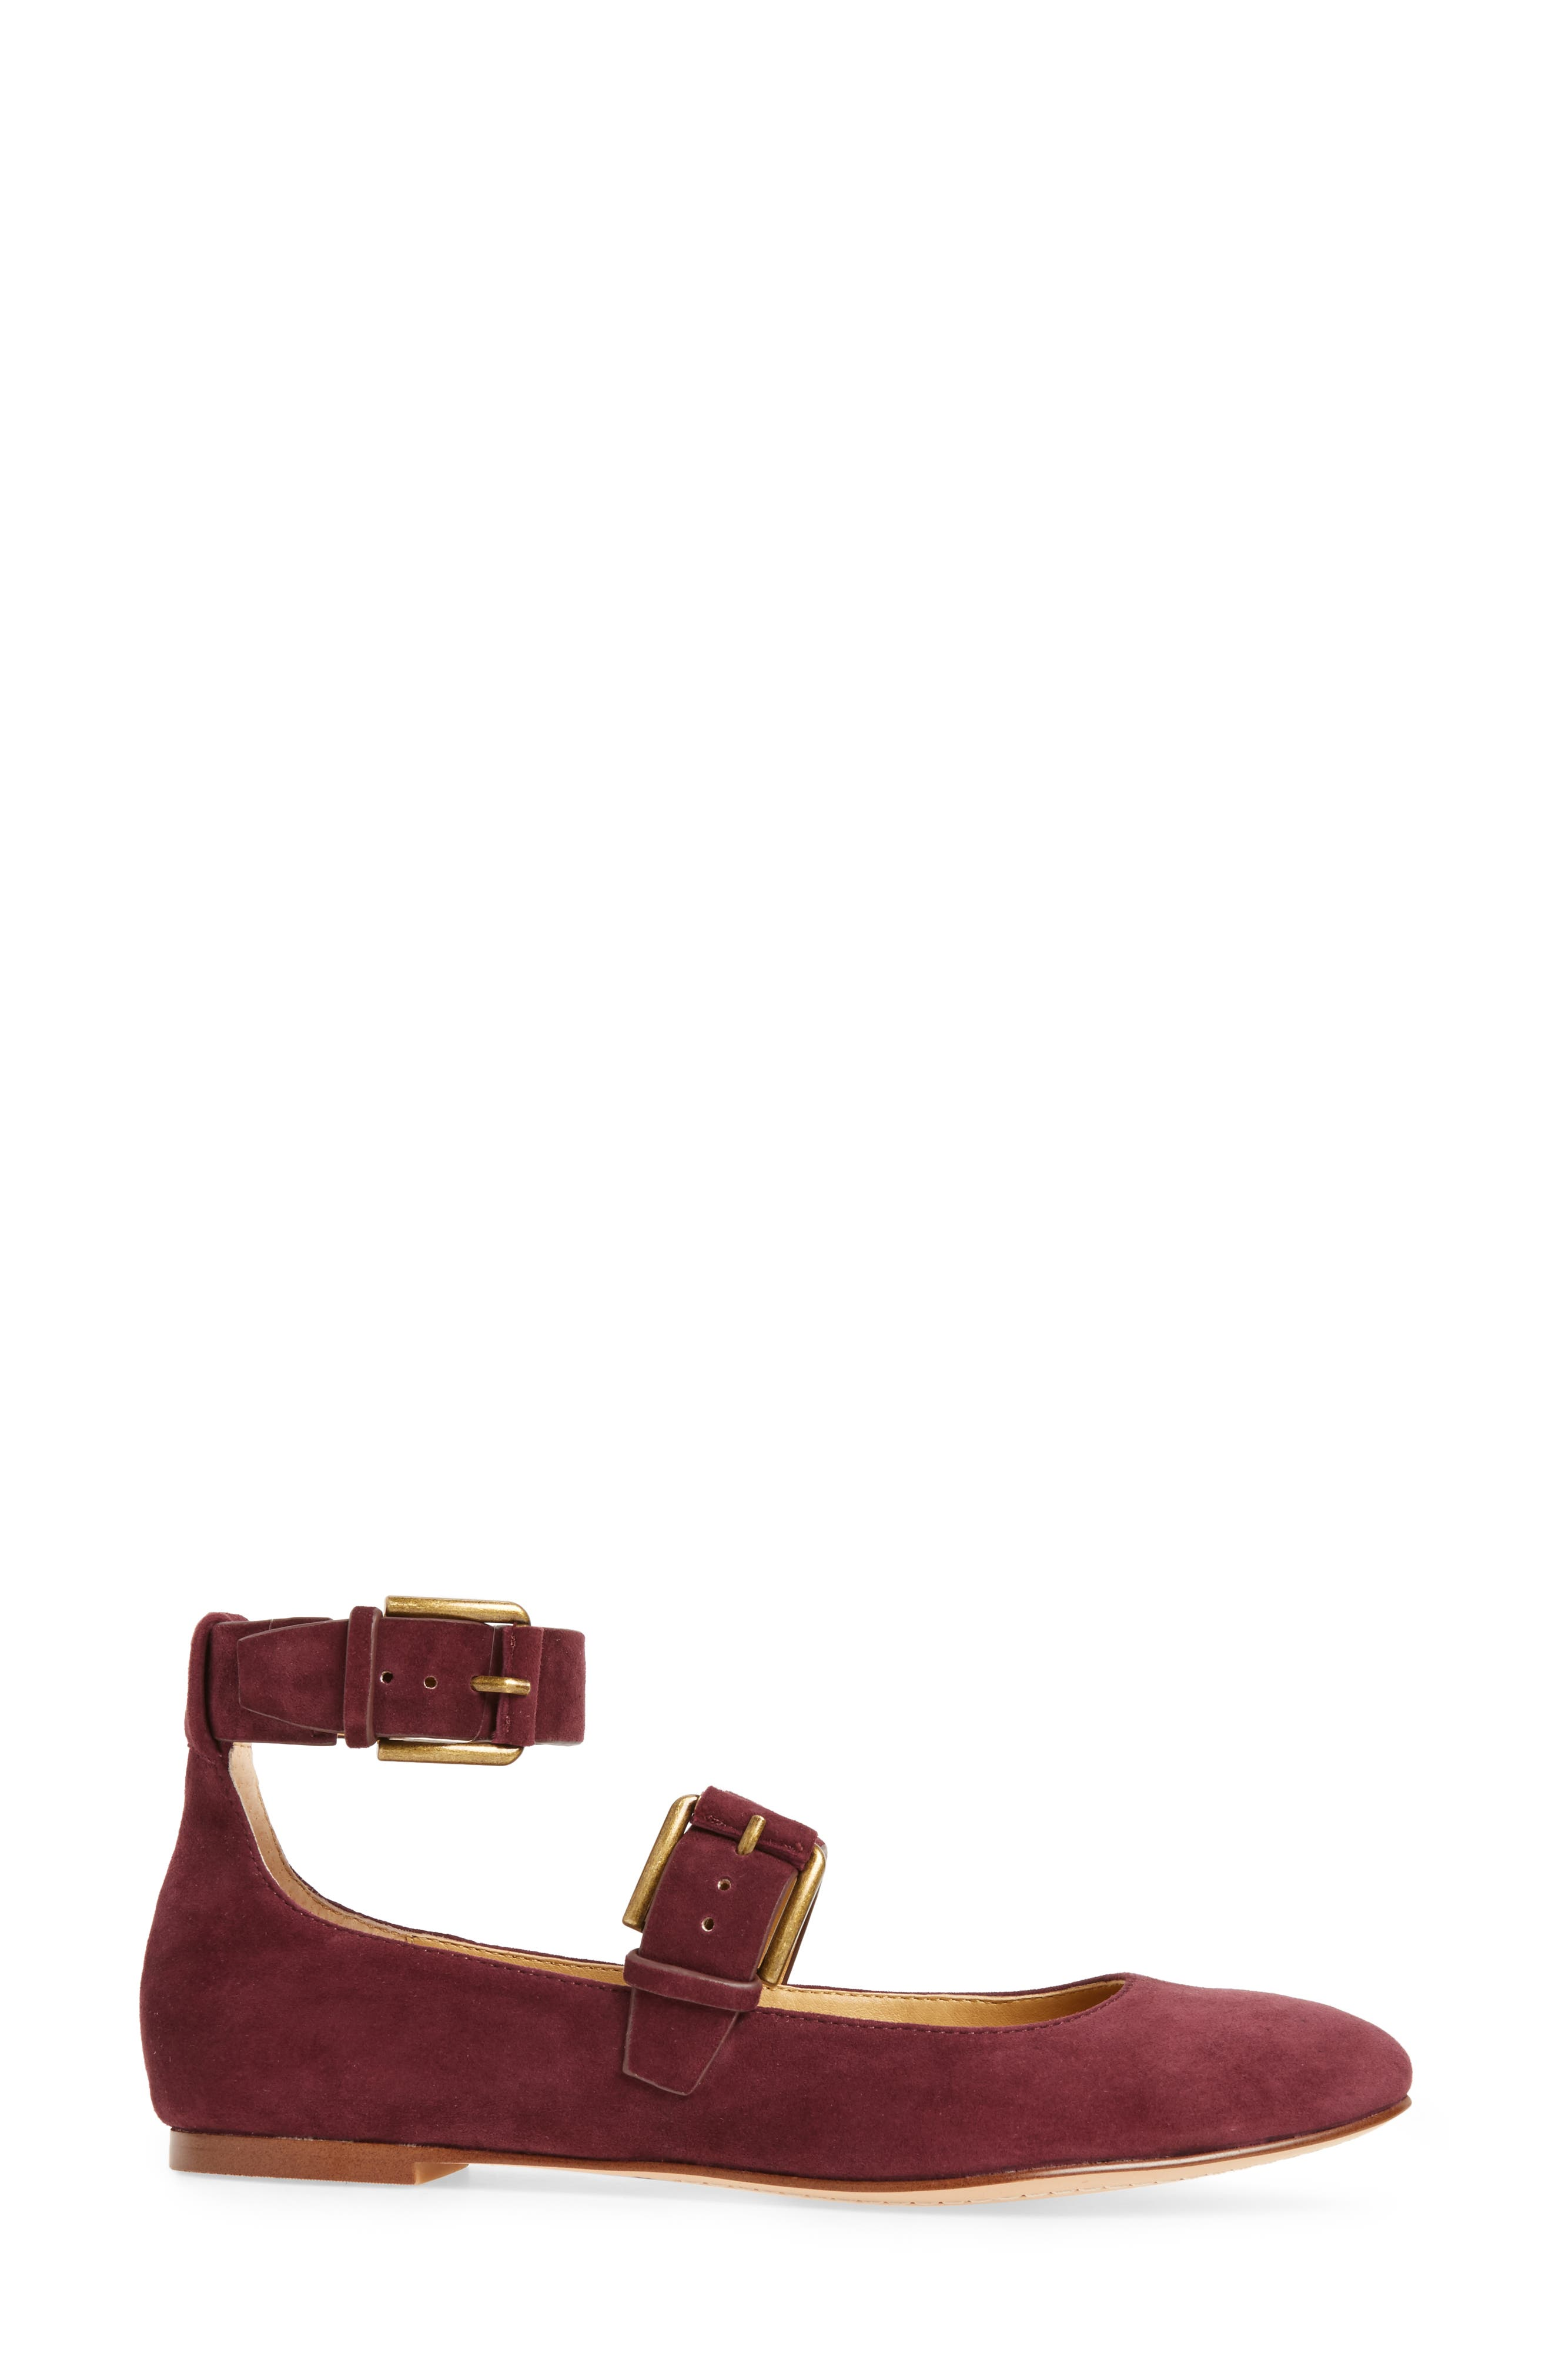 Dalenna Ankle Strap Ballet Flat,                             Alternate thumbnail 3, color,                             Wine Suede